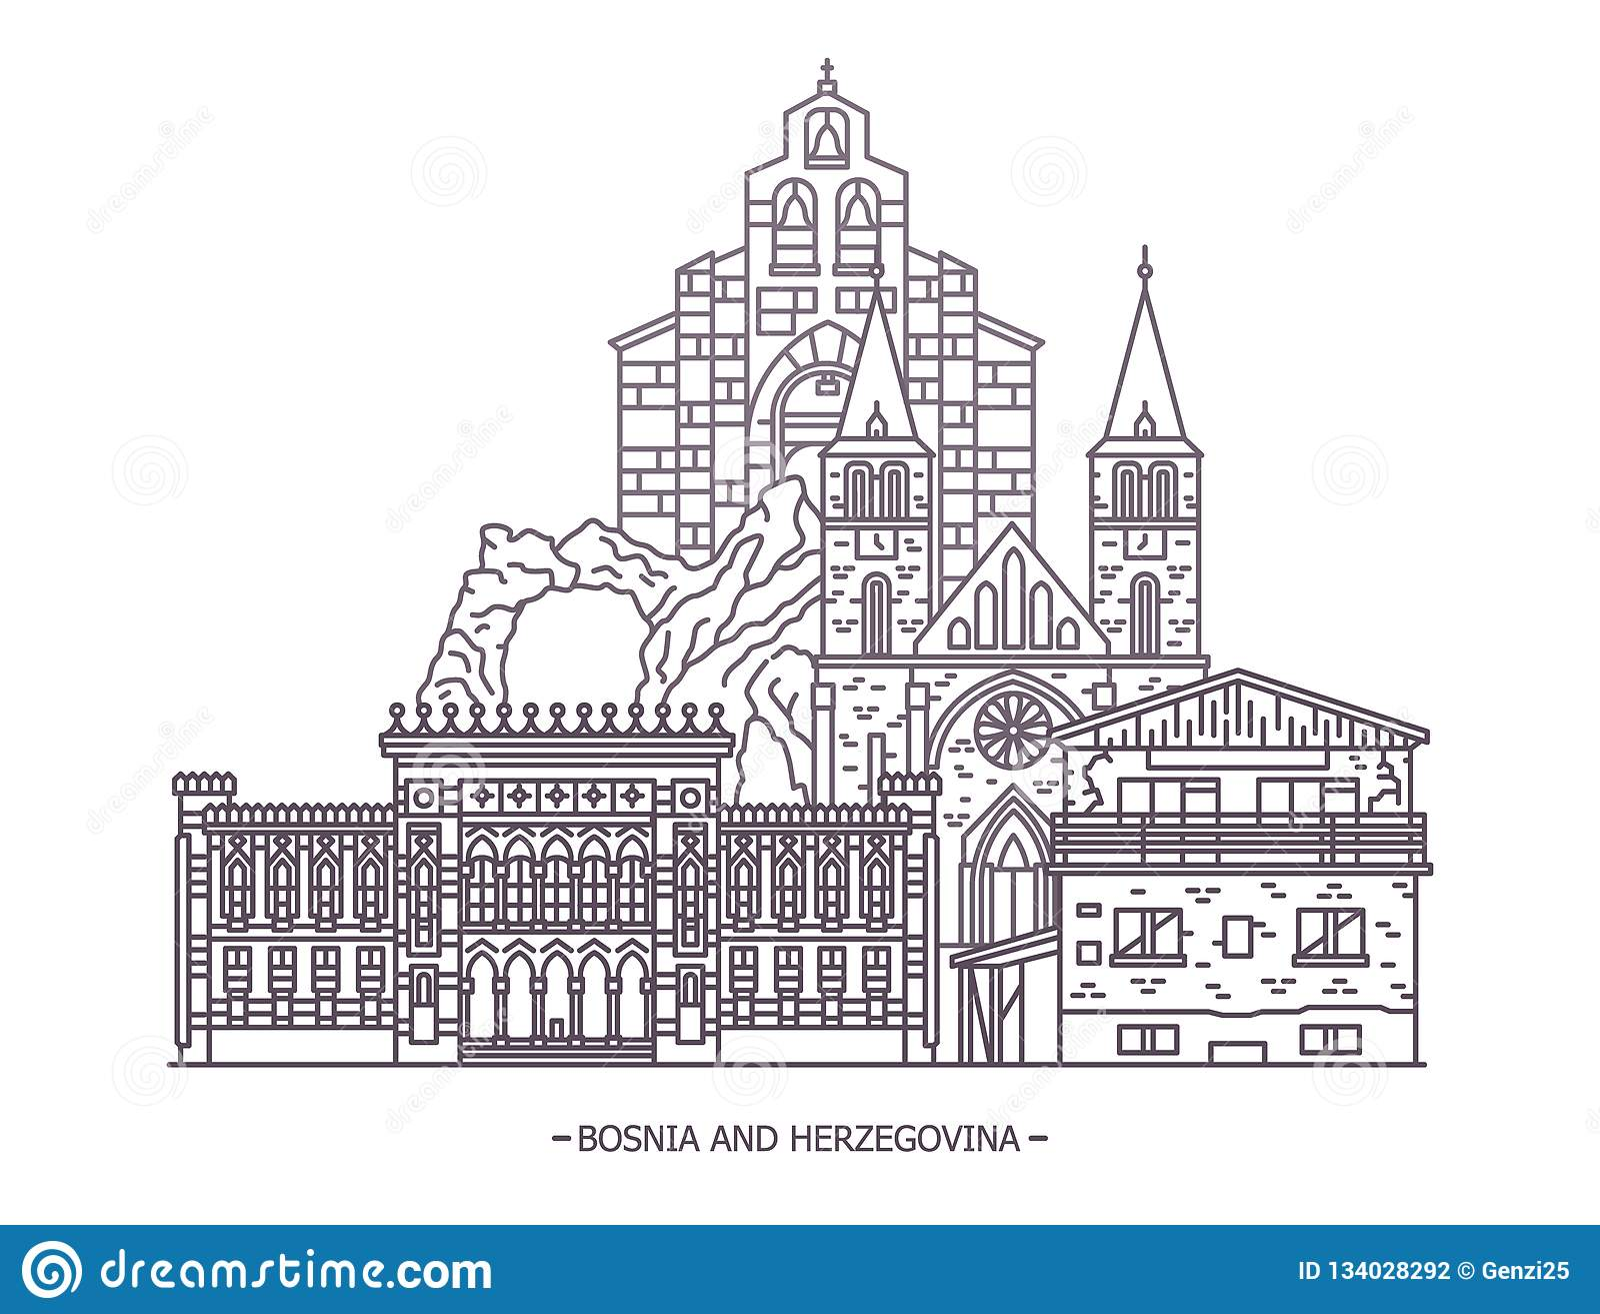 Ориентир ориентиры Босния и Герцеговина